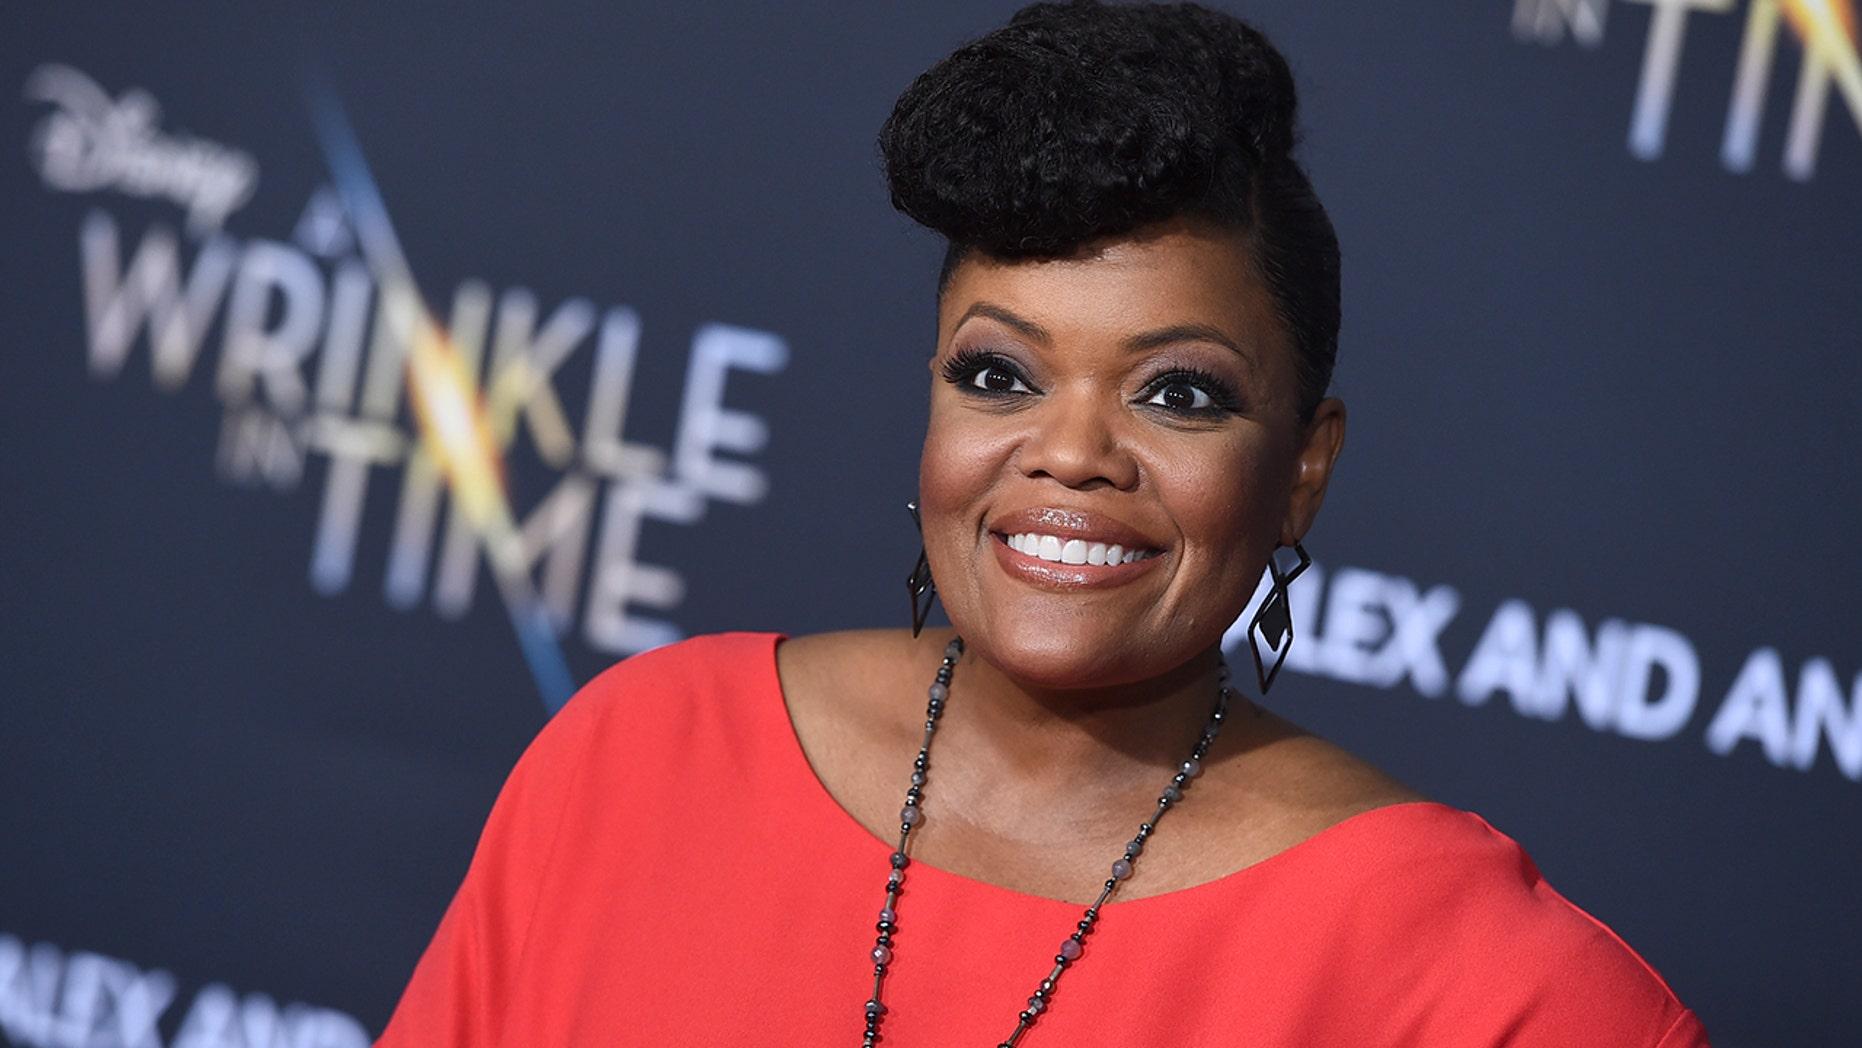 Former 'Community' actress Yvette Nicole Brown will interim host AMC's' 'Talking Dead' for Chris Hardwick